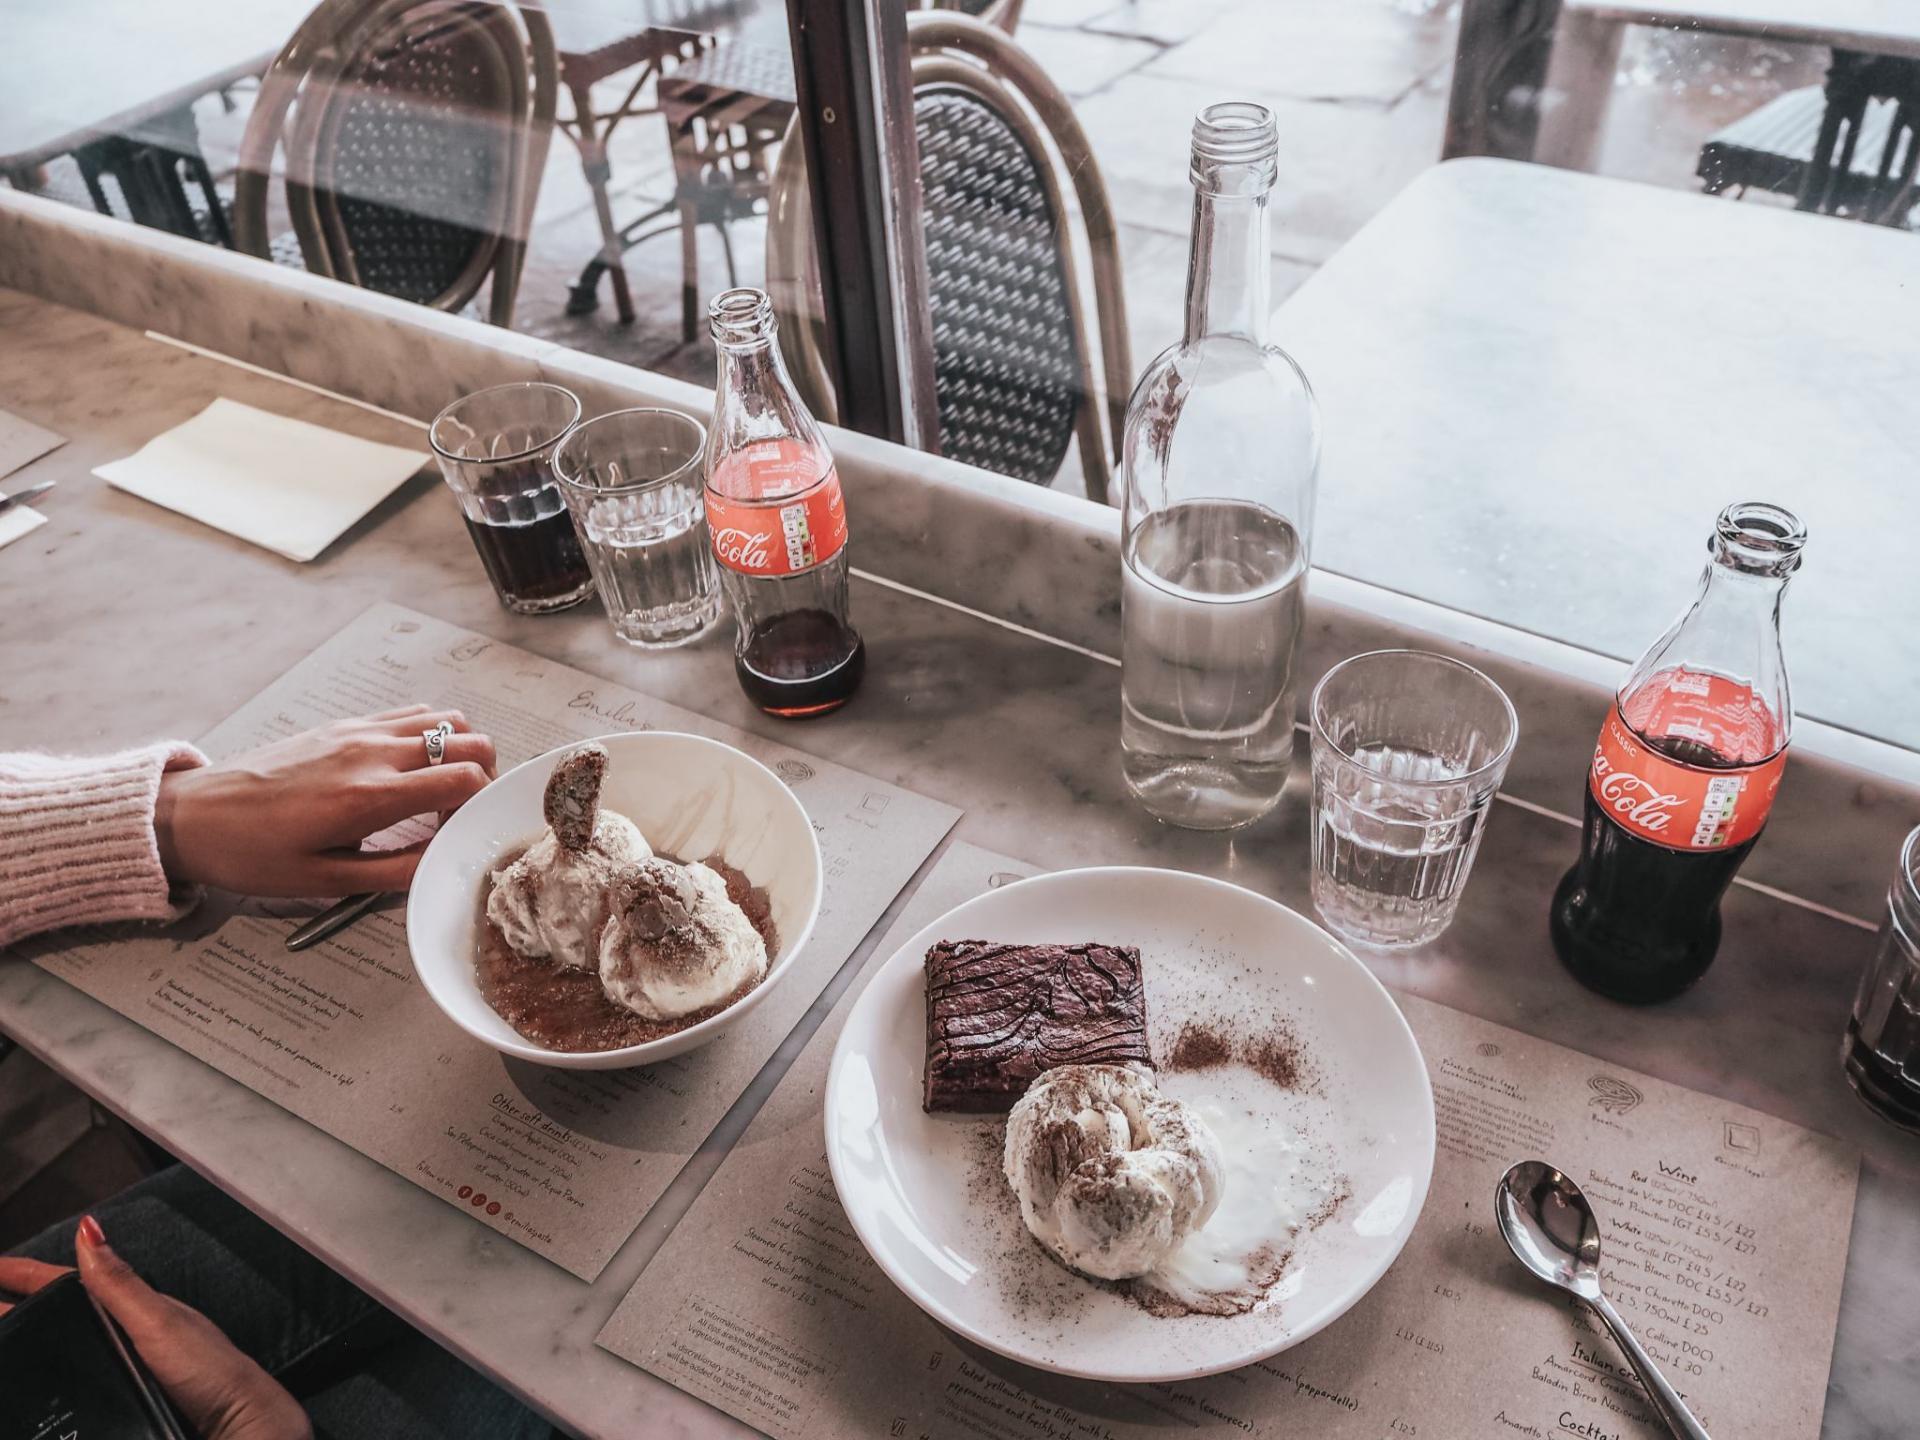 Emilia's Pasta St. Katherine's Dock review